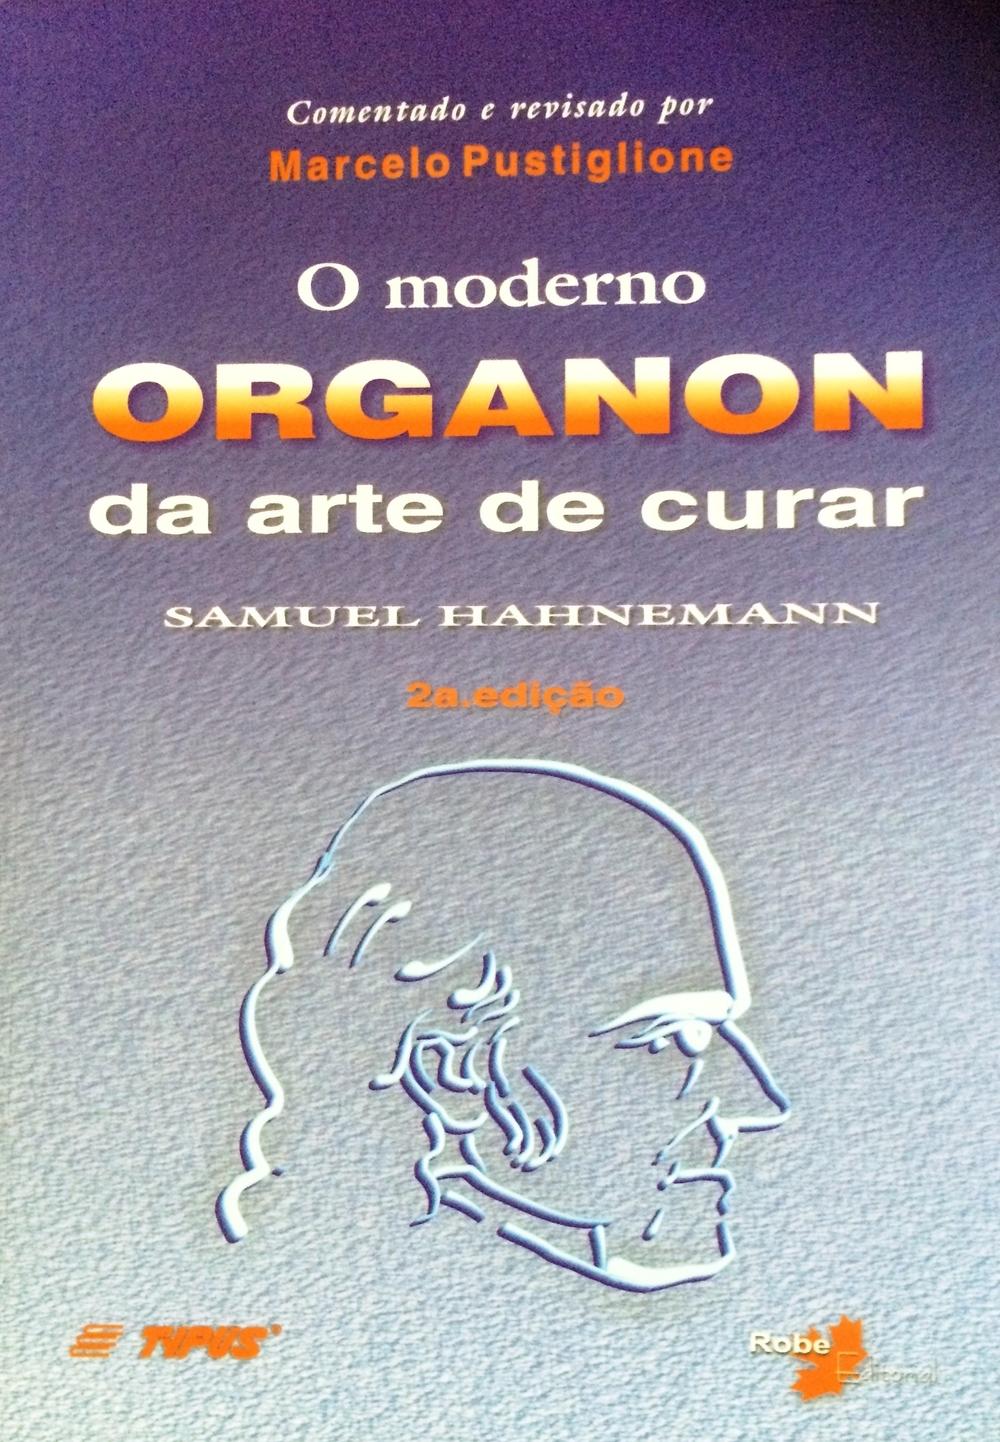 Organon moderno 2 ed.jpg